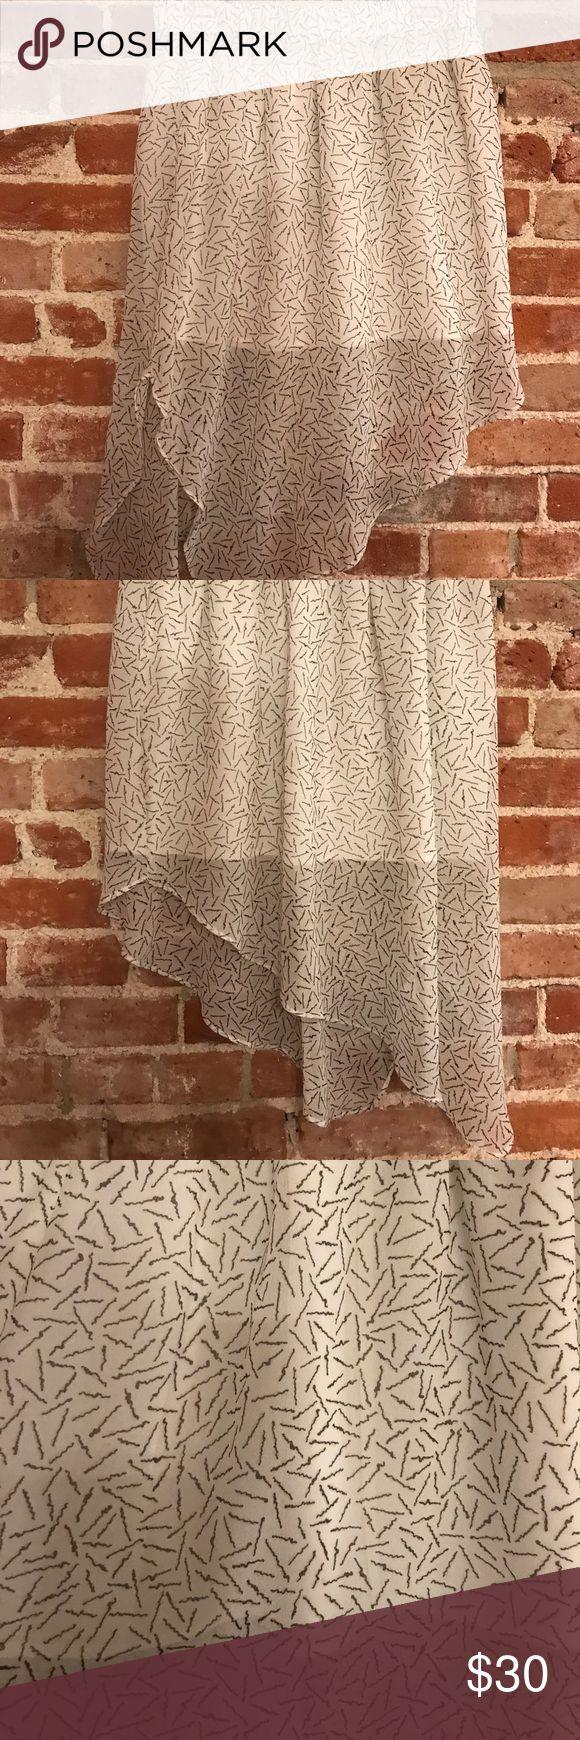 Asymmetrical BCBGeneration skirt Asymmetrical white skirt with black line design. The skirt has a shorter white liner under to add some very cool dimension to the skirt. BCBGeneration Skirts Asymmetrical